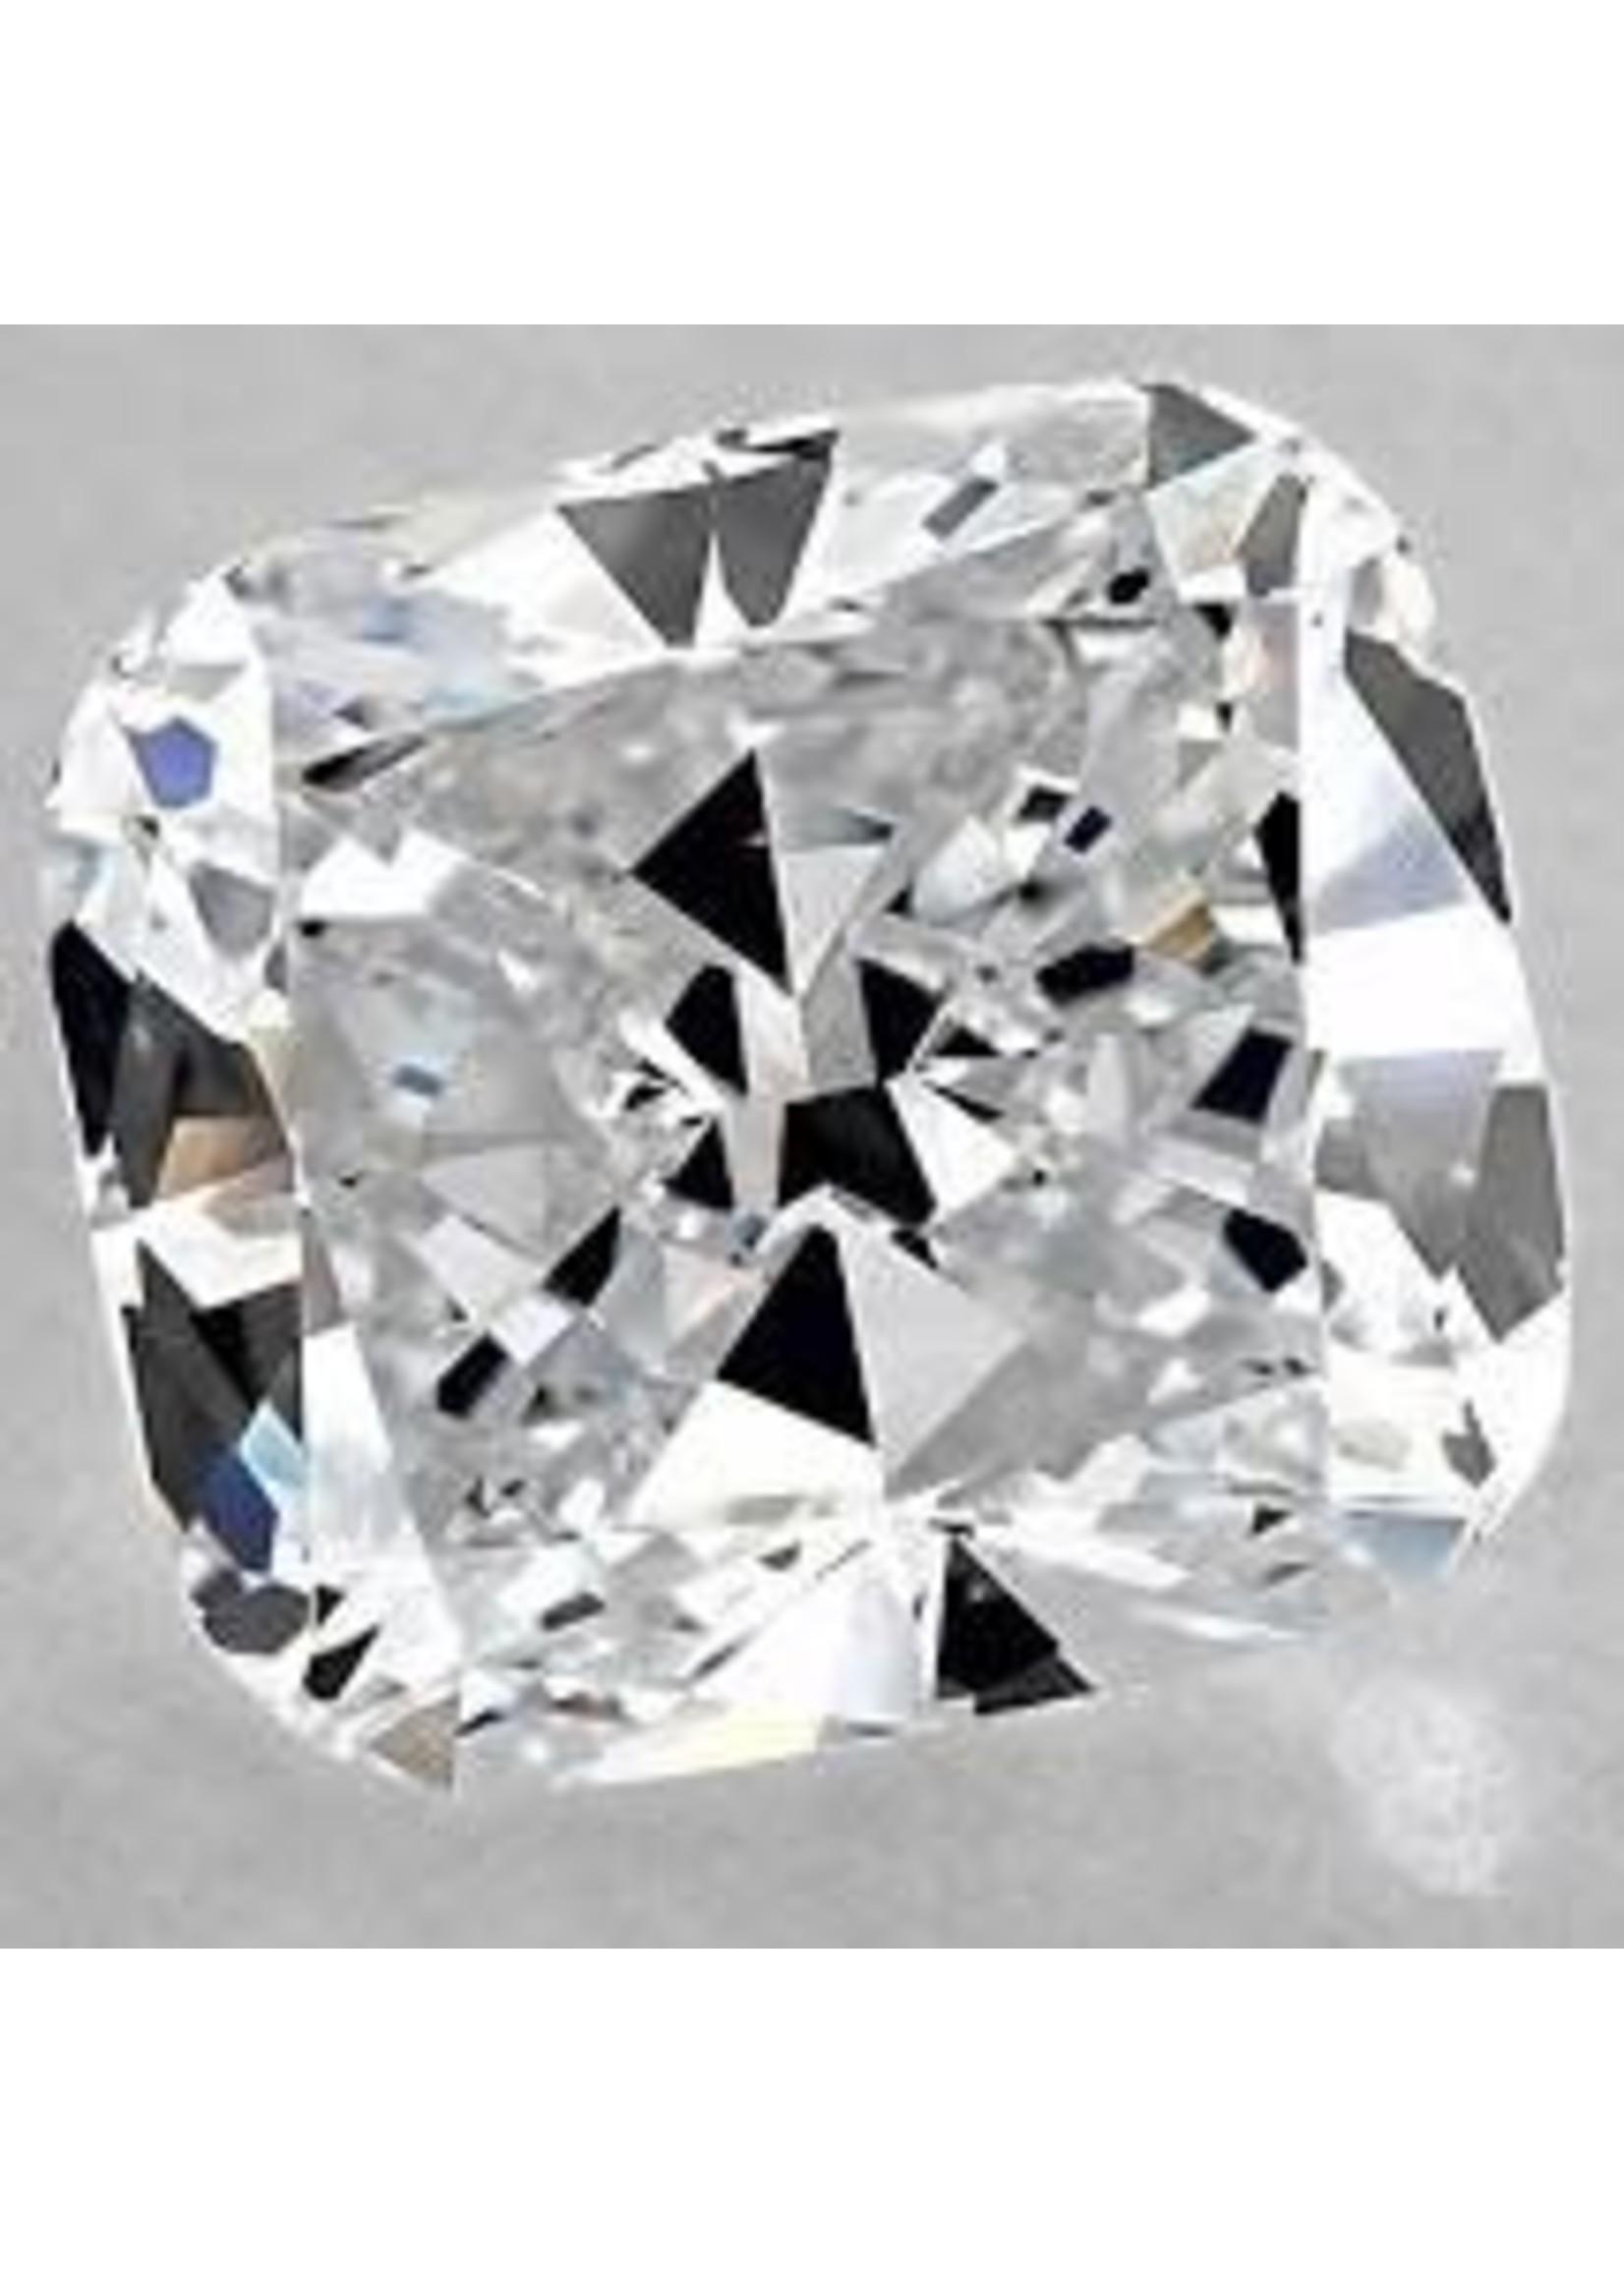 Jewellery 3.40 CT CUSHION DIAMOND E VS2 ECVELLENT CUT GIA #2286974520